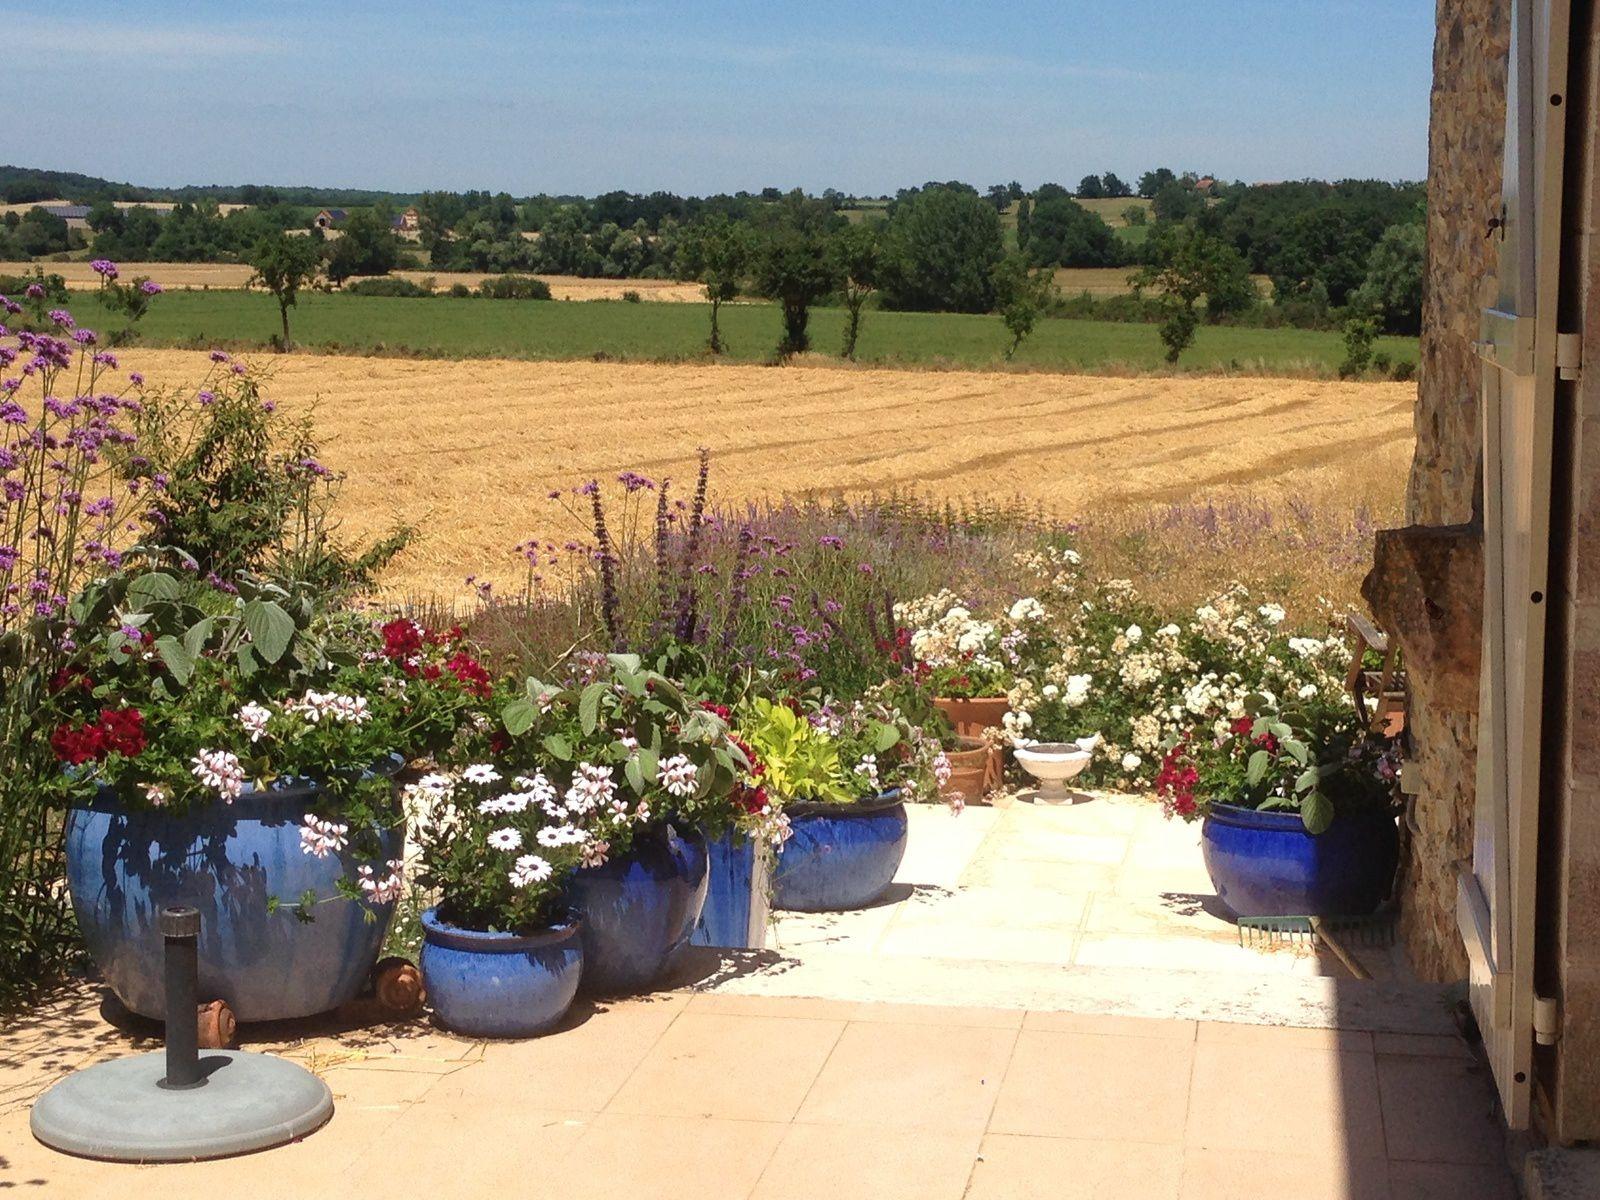 Le Jardin de L'Arbre - Aveyron